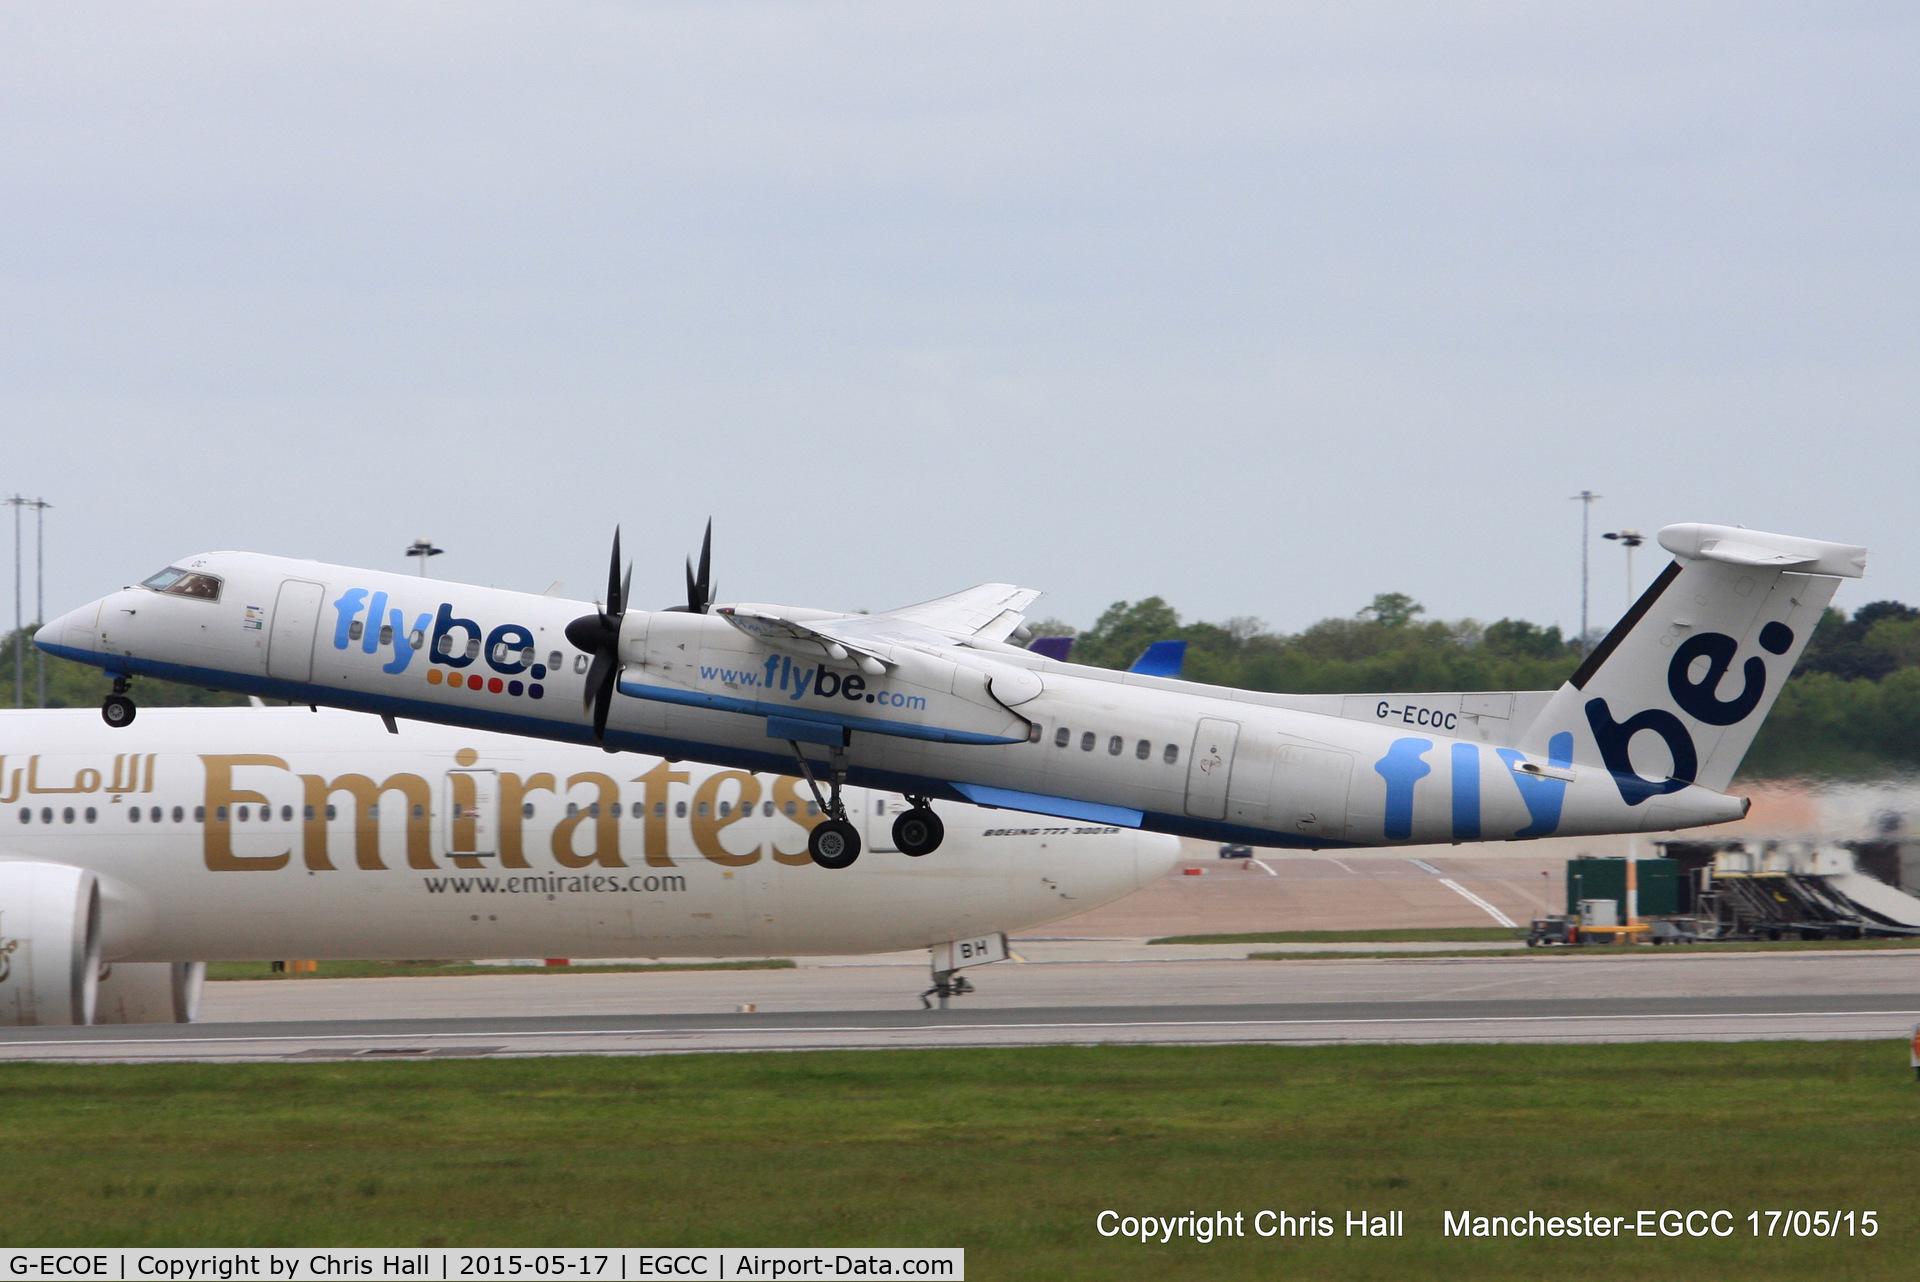 G-ECOE, 2008 De Havilland Canada DHC-8-402Q Dash 8 C/N 4212, flybe